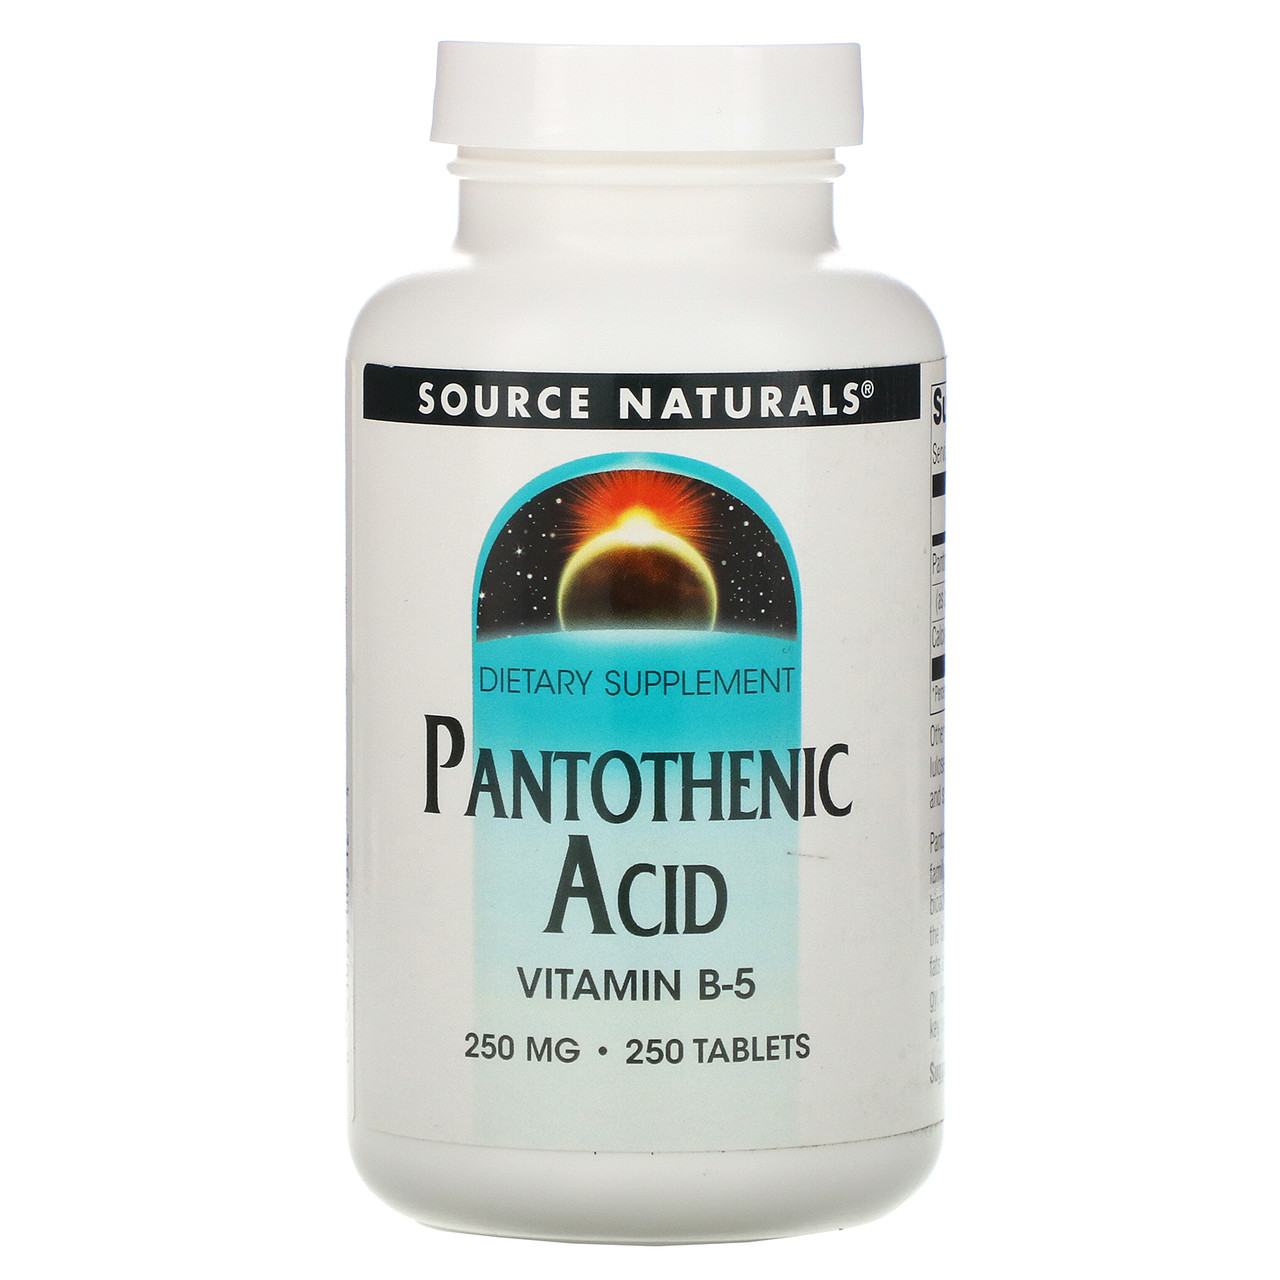 Пантотеновая кислота (Vitamin B-5), Source Naturals, 250 мг, 250 таб.